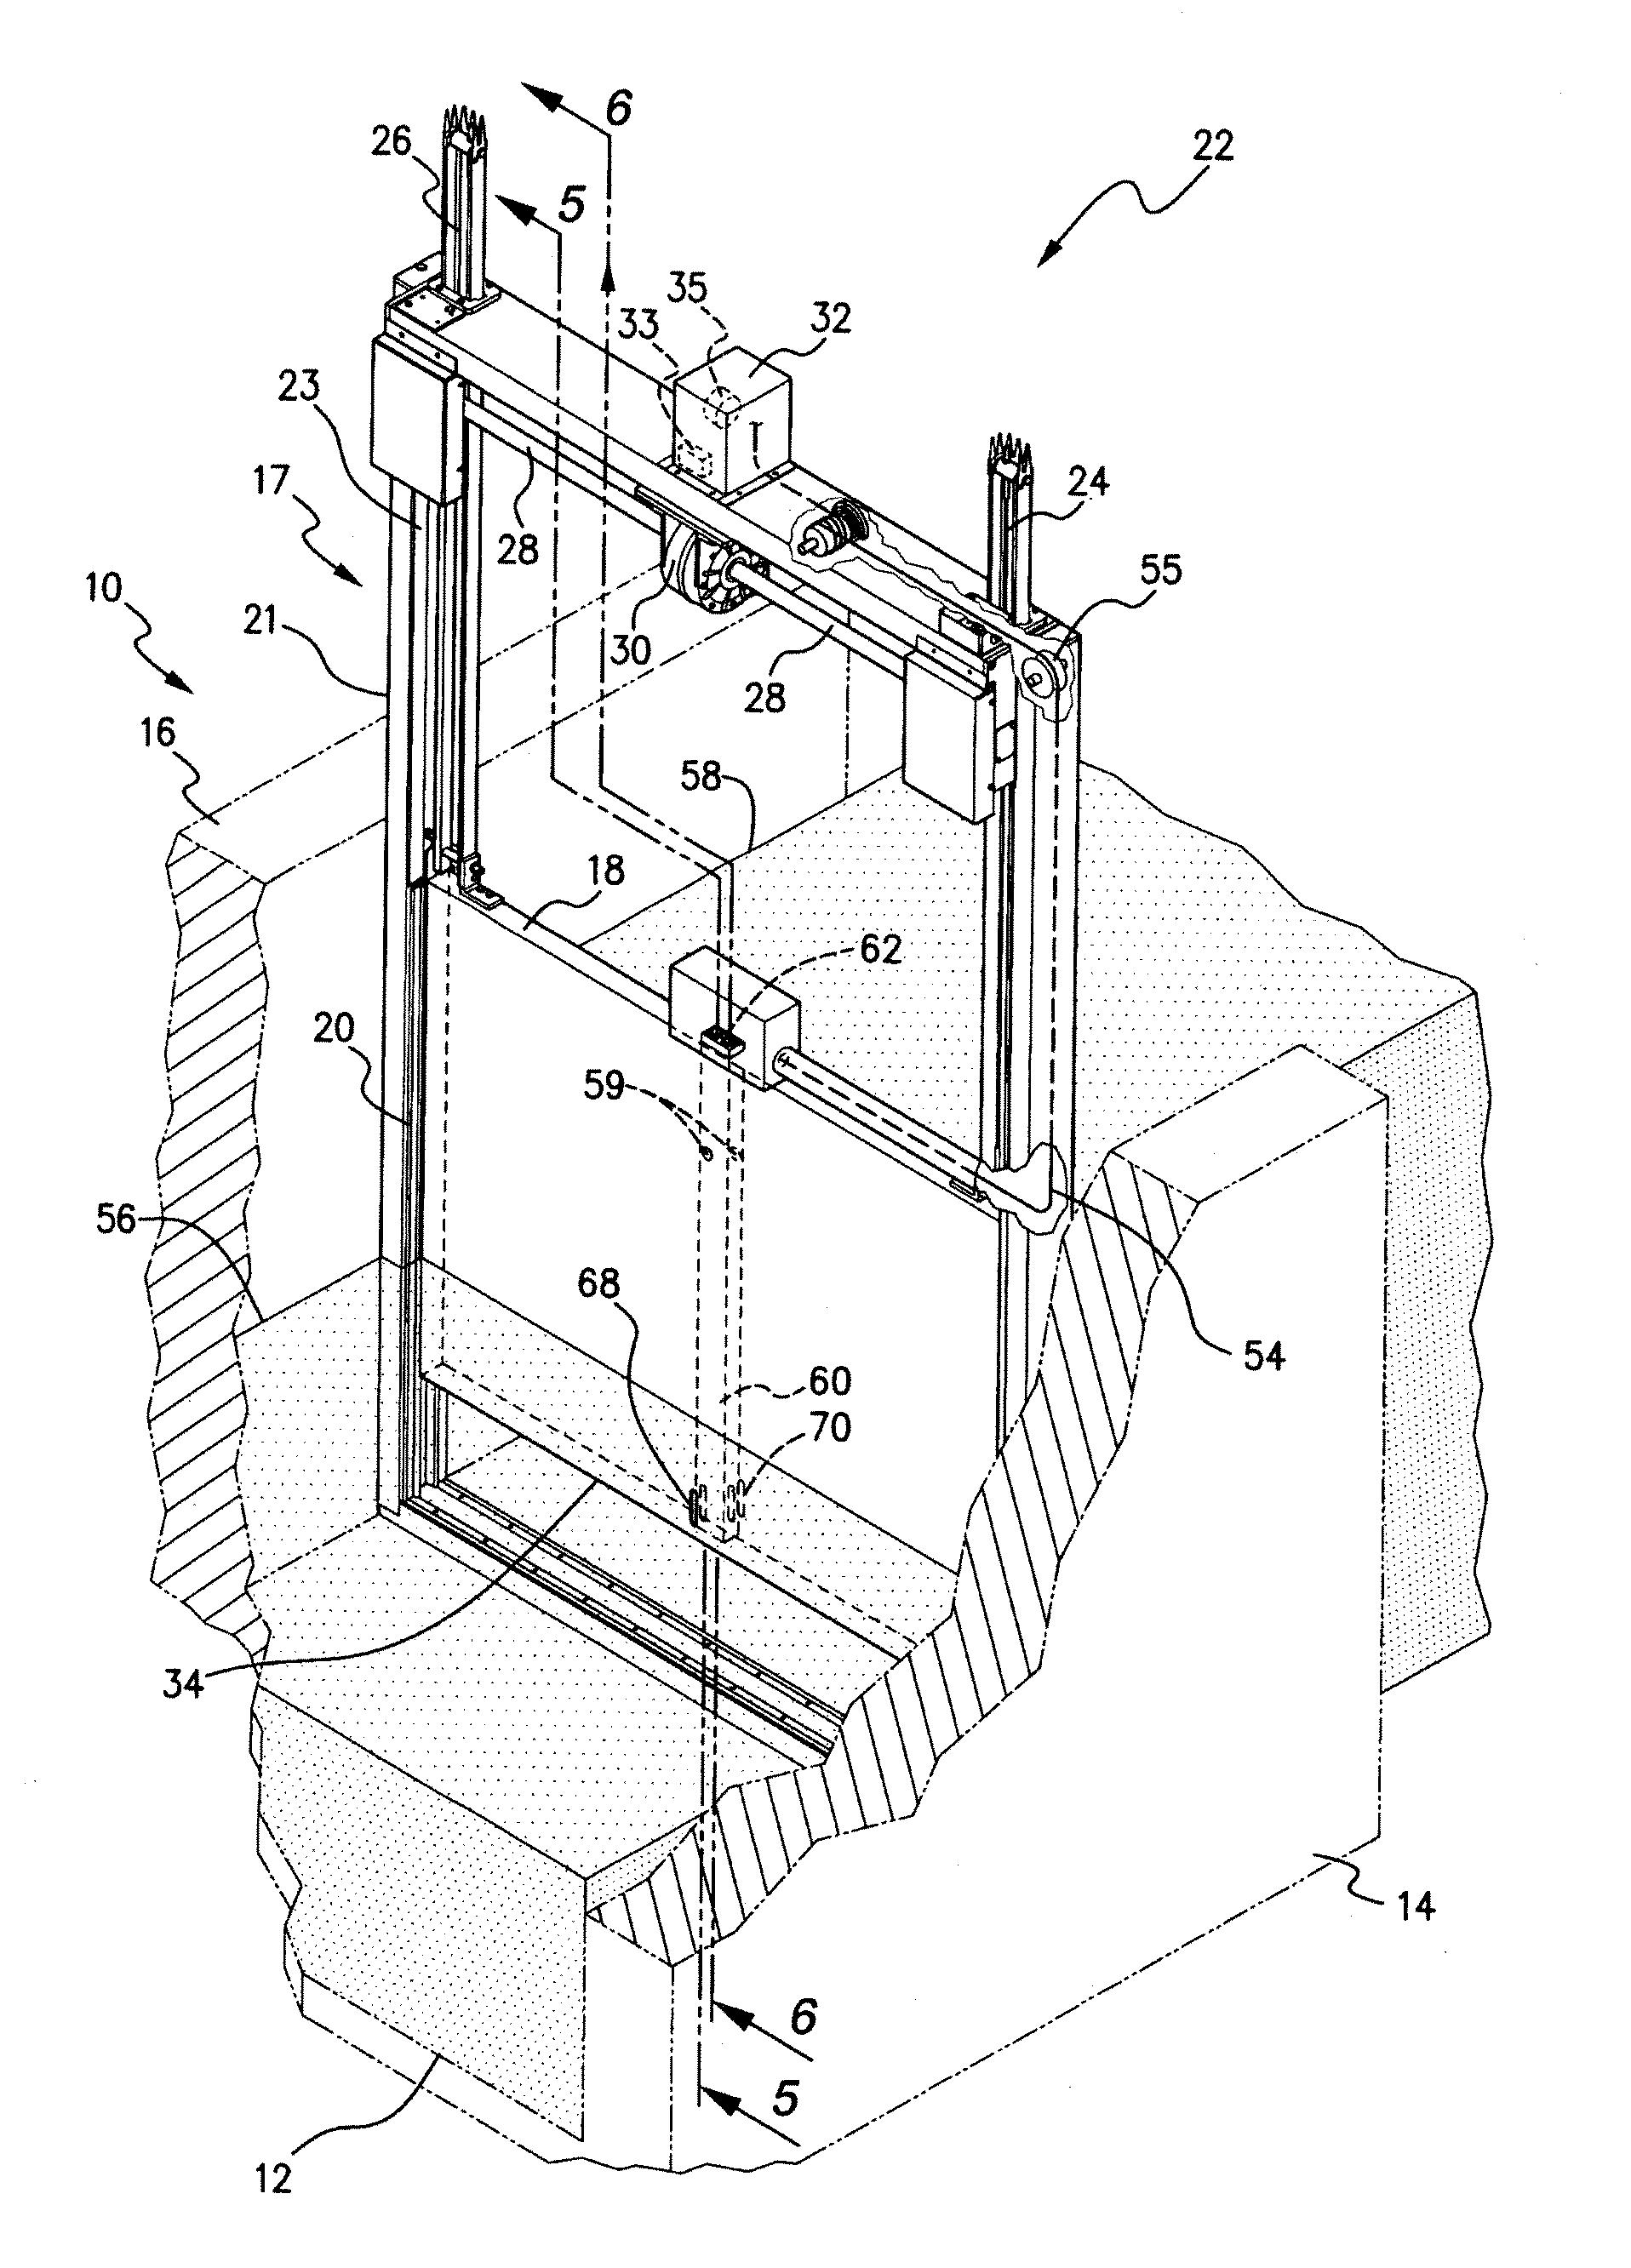 sluice gate design calculations pdf